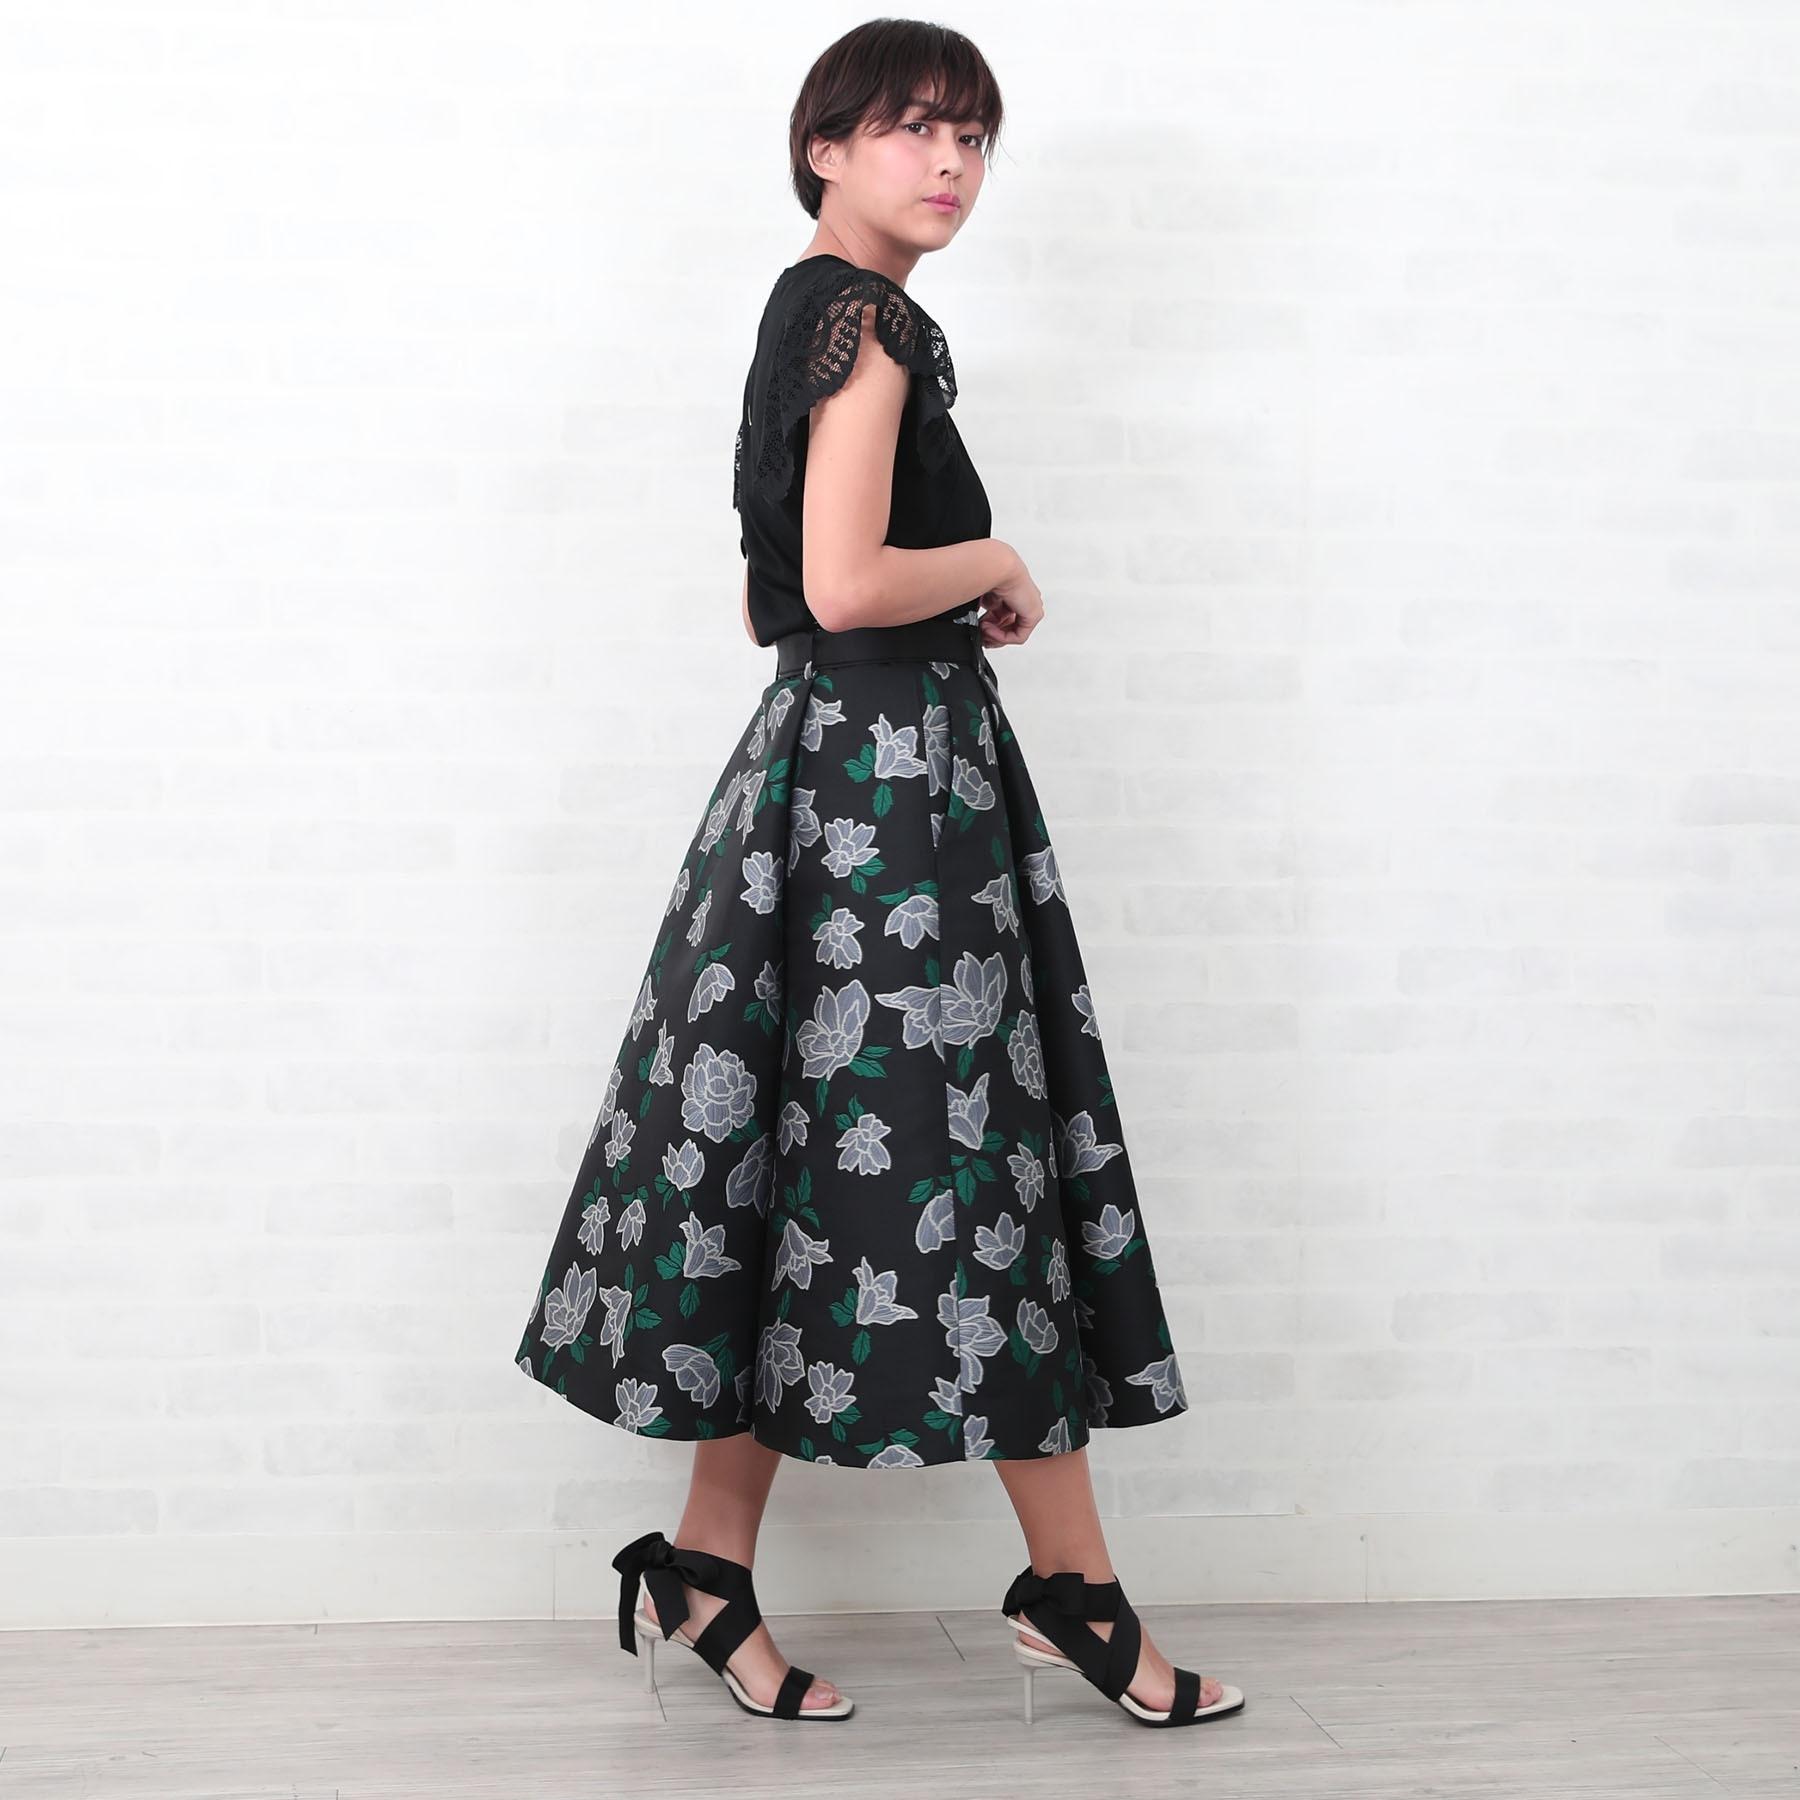 『HYERES Jacquard』Long Skirt MONOTONE画像